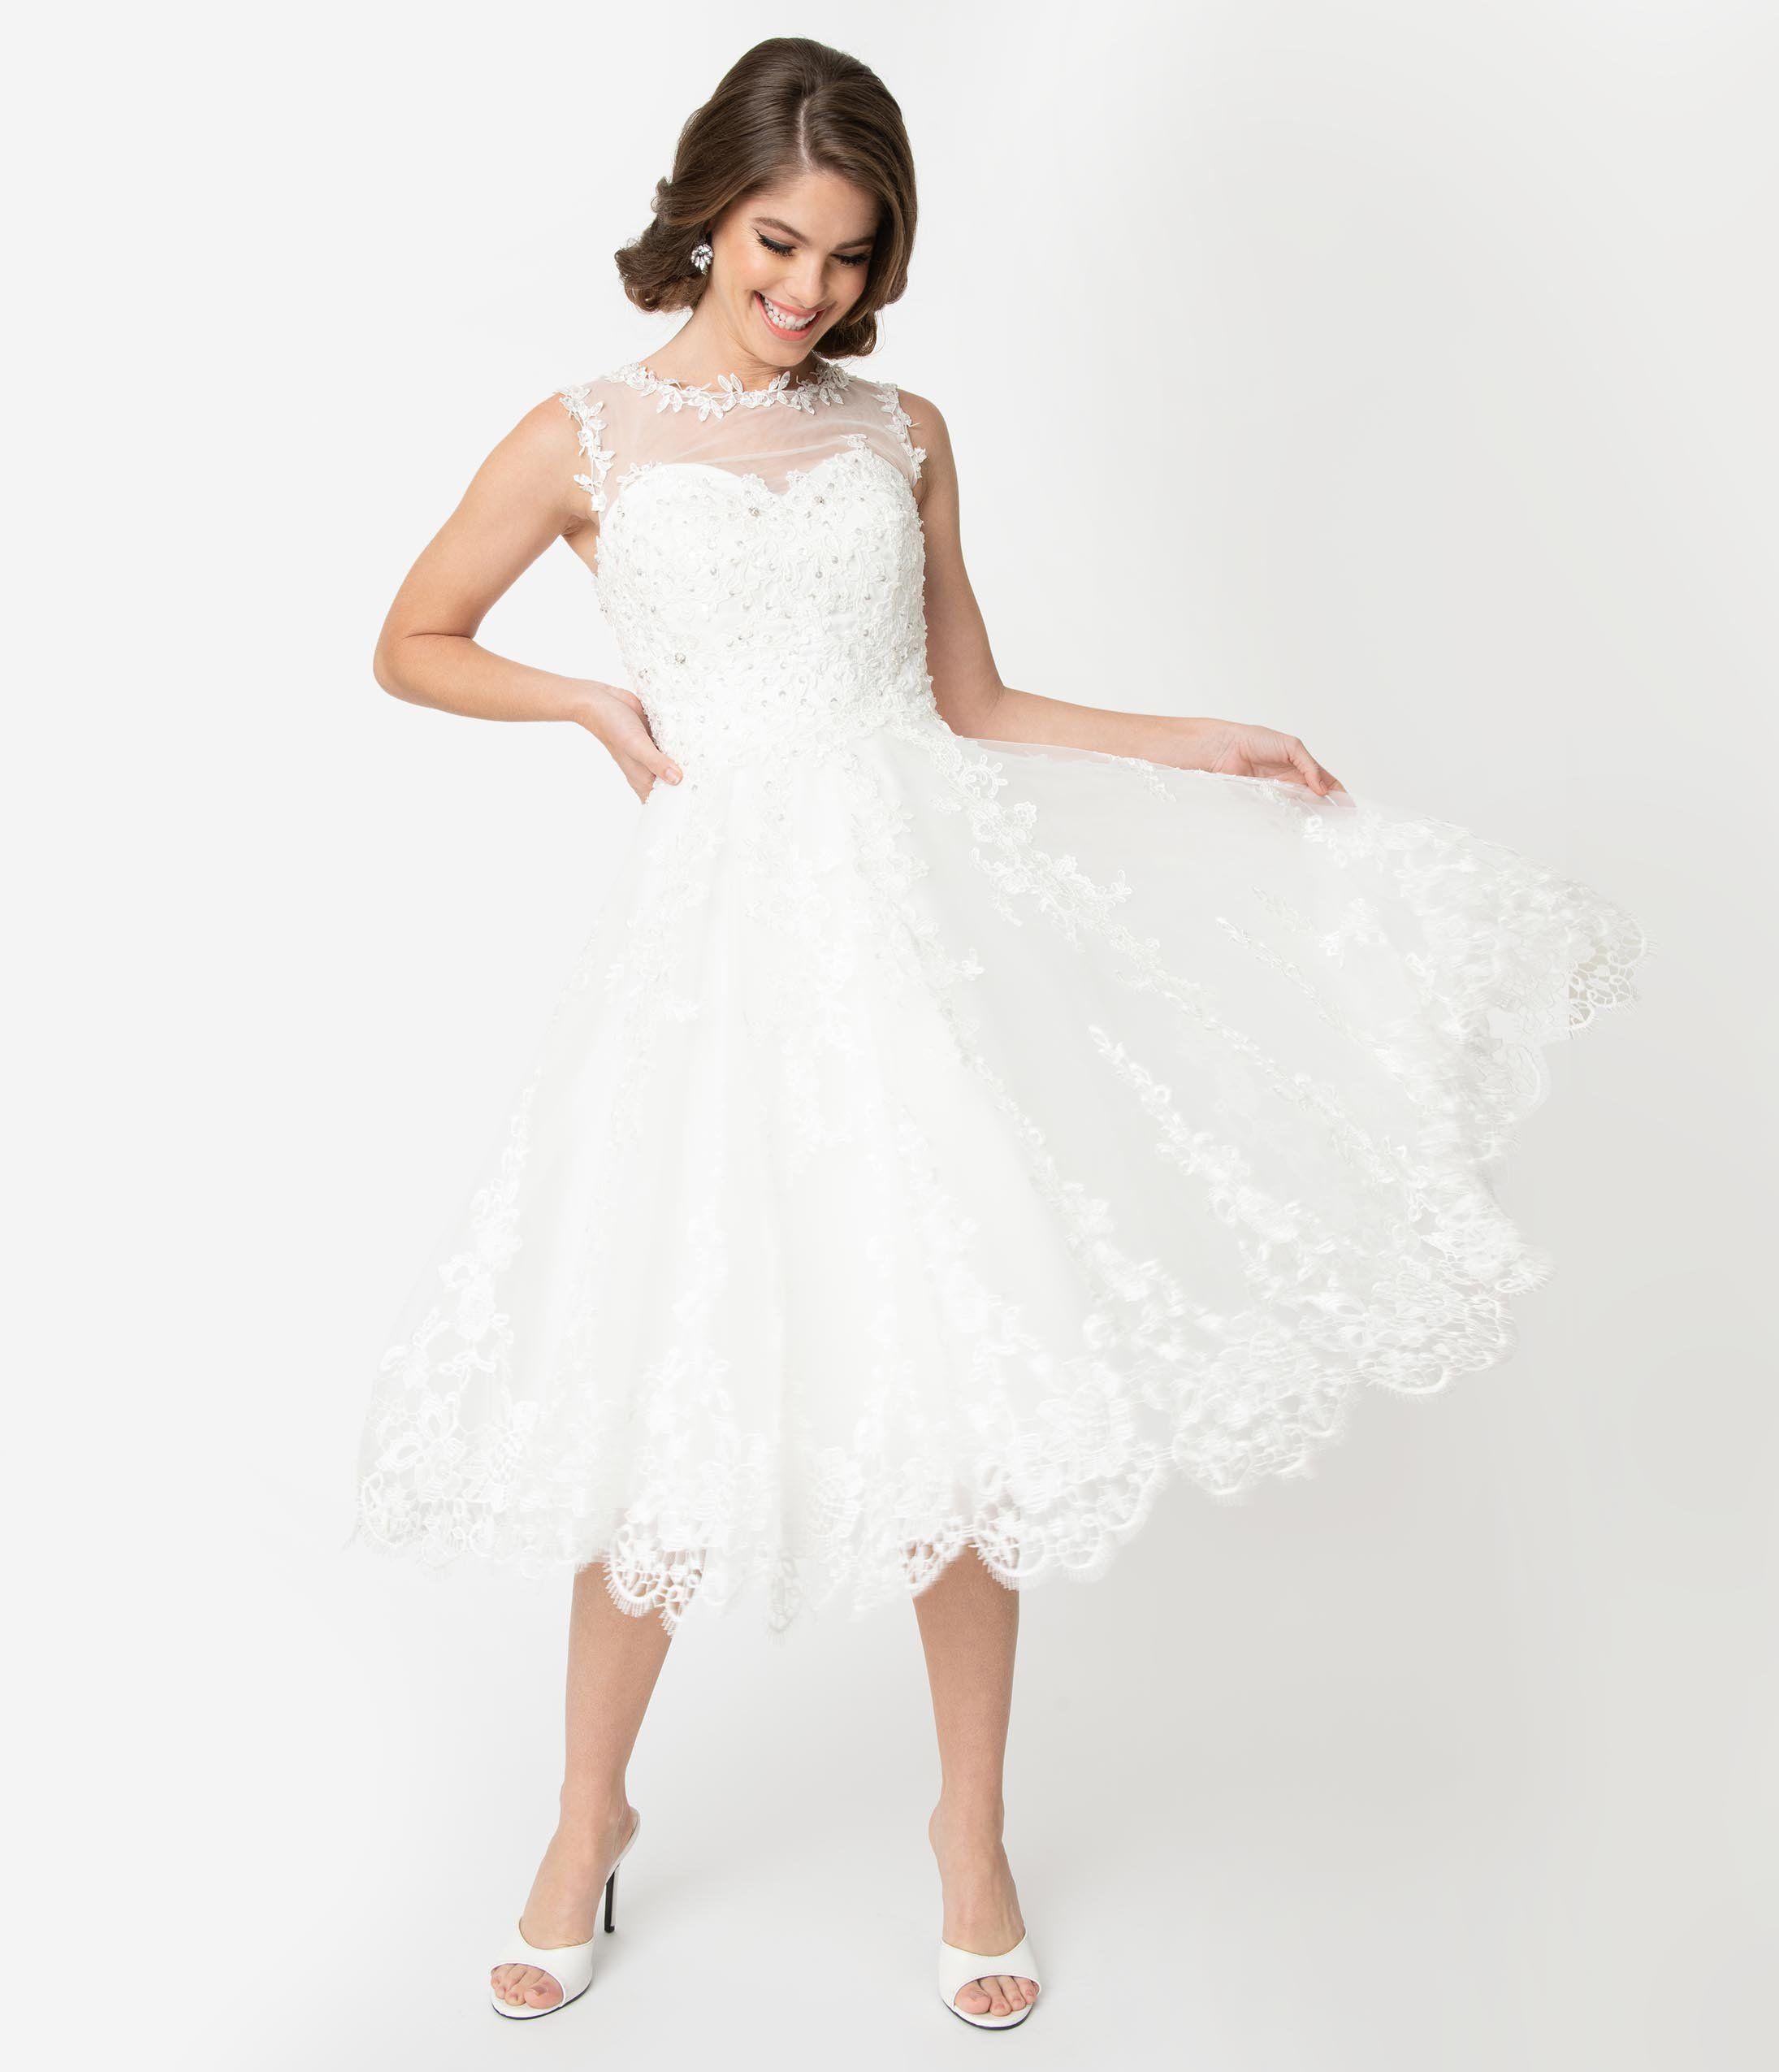 Unique Vintage 1950s Style Ivory Lace Tulle Riviera Bridal Dress Tea Length Wedding Dress Bridal Dresses Lace Wedding Dresses Unique